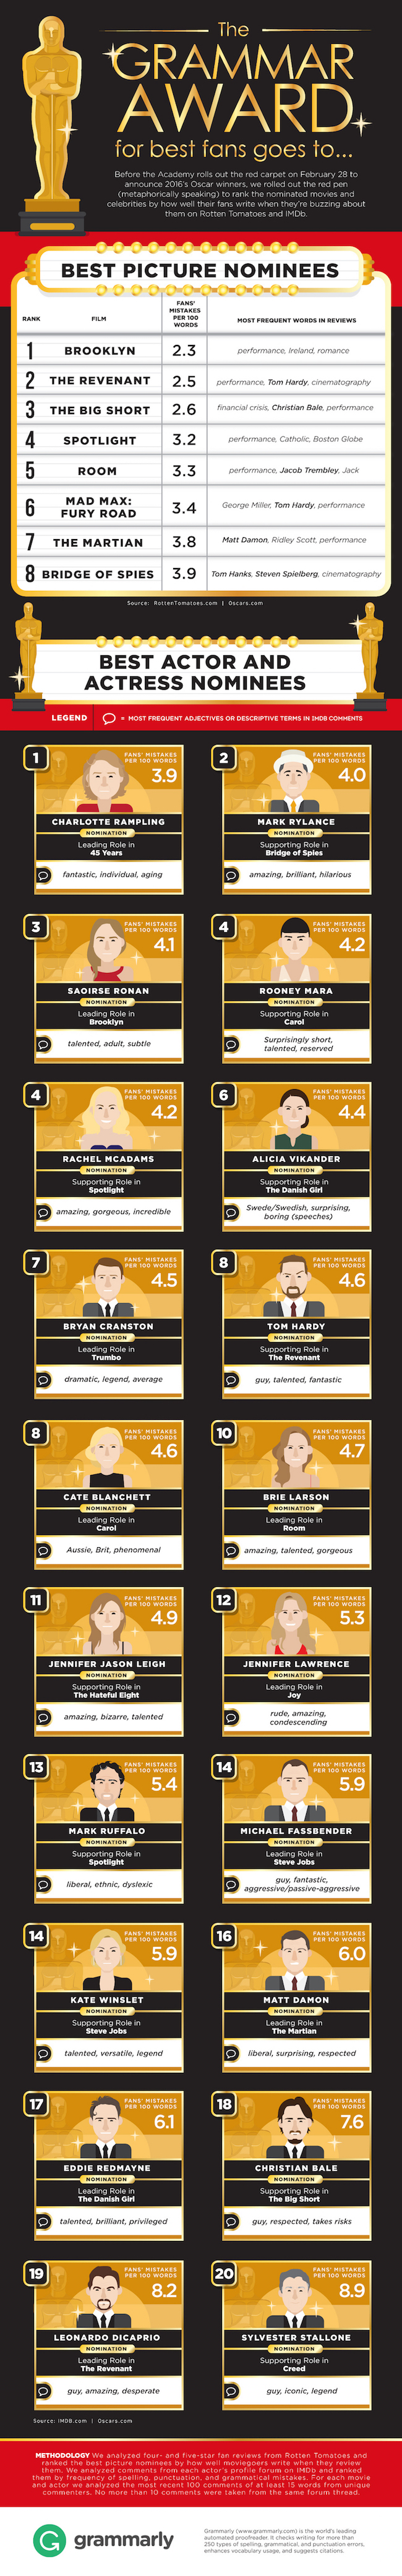 Grammarly Academy Awards Grammar Study Infographic